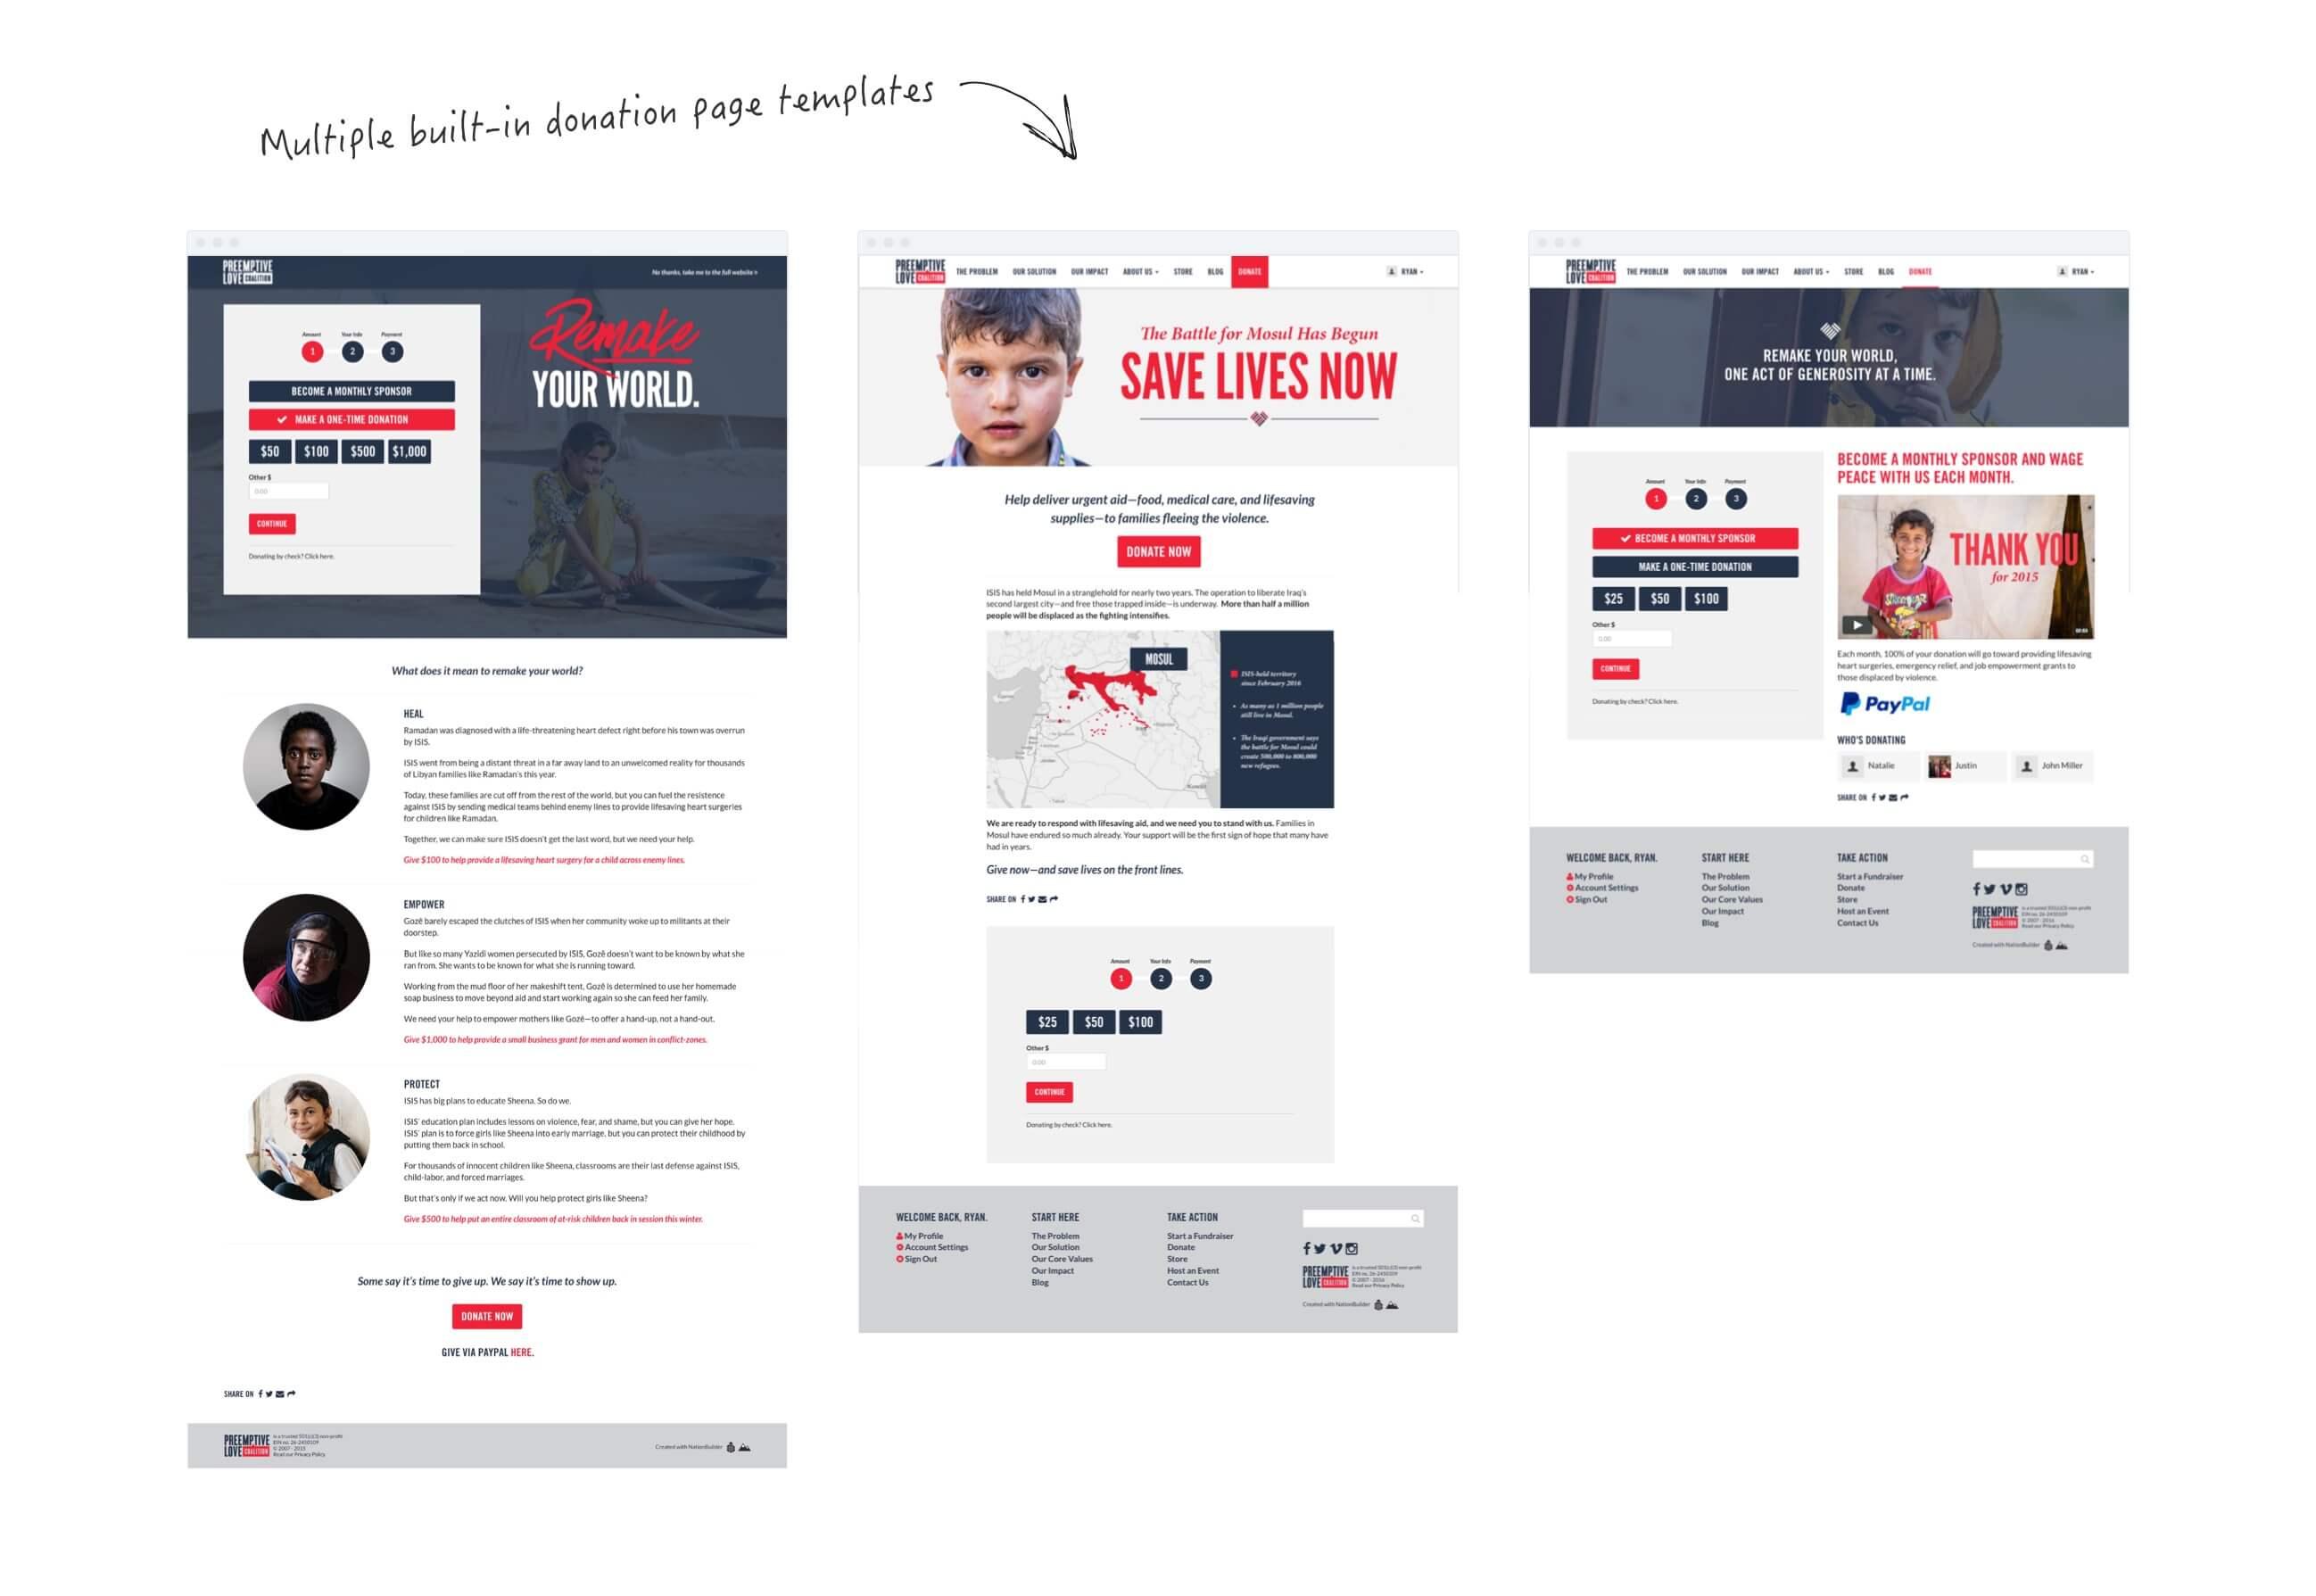 4_-_Donation_templates.jpg